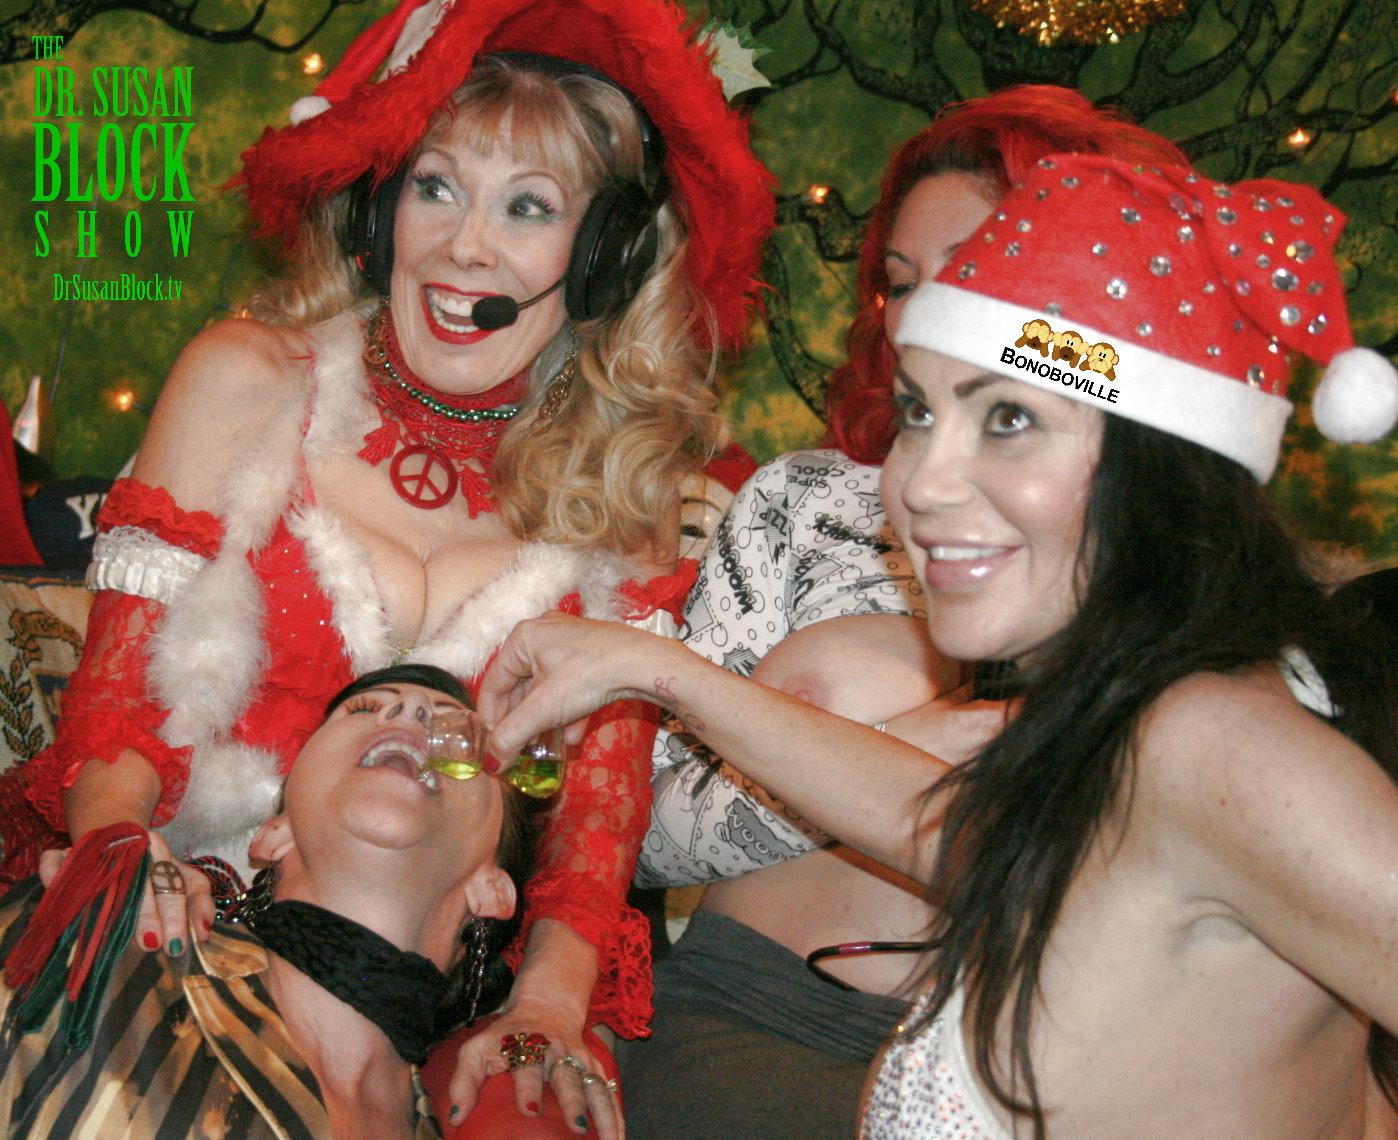 The Mad Elves of Bonoboville. Photo: L'erotique